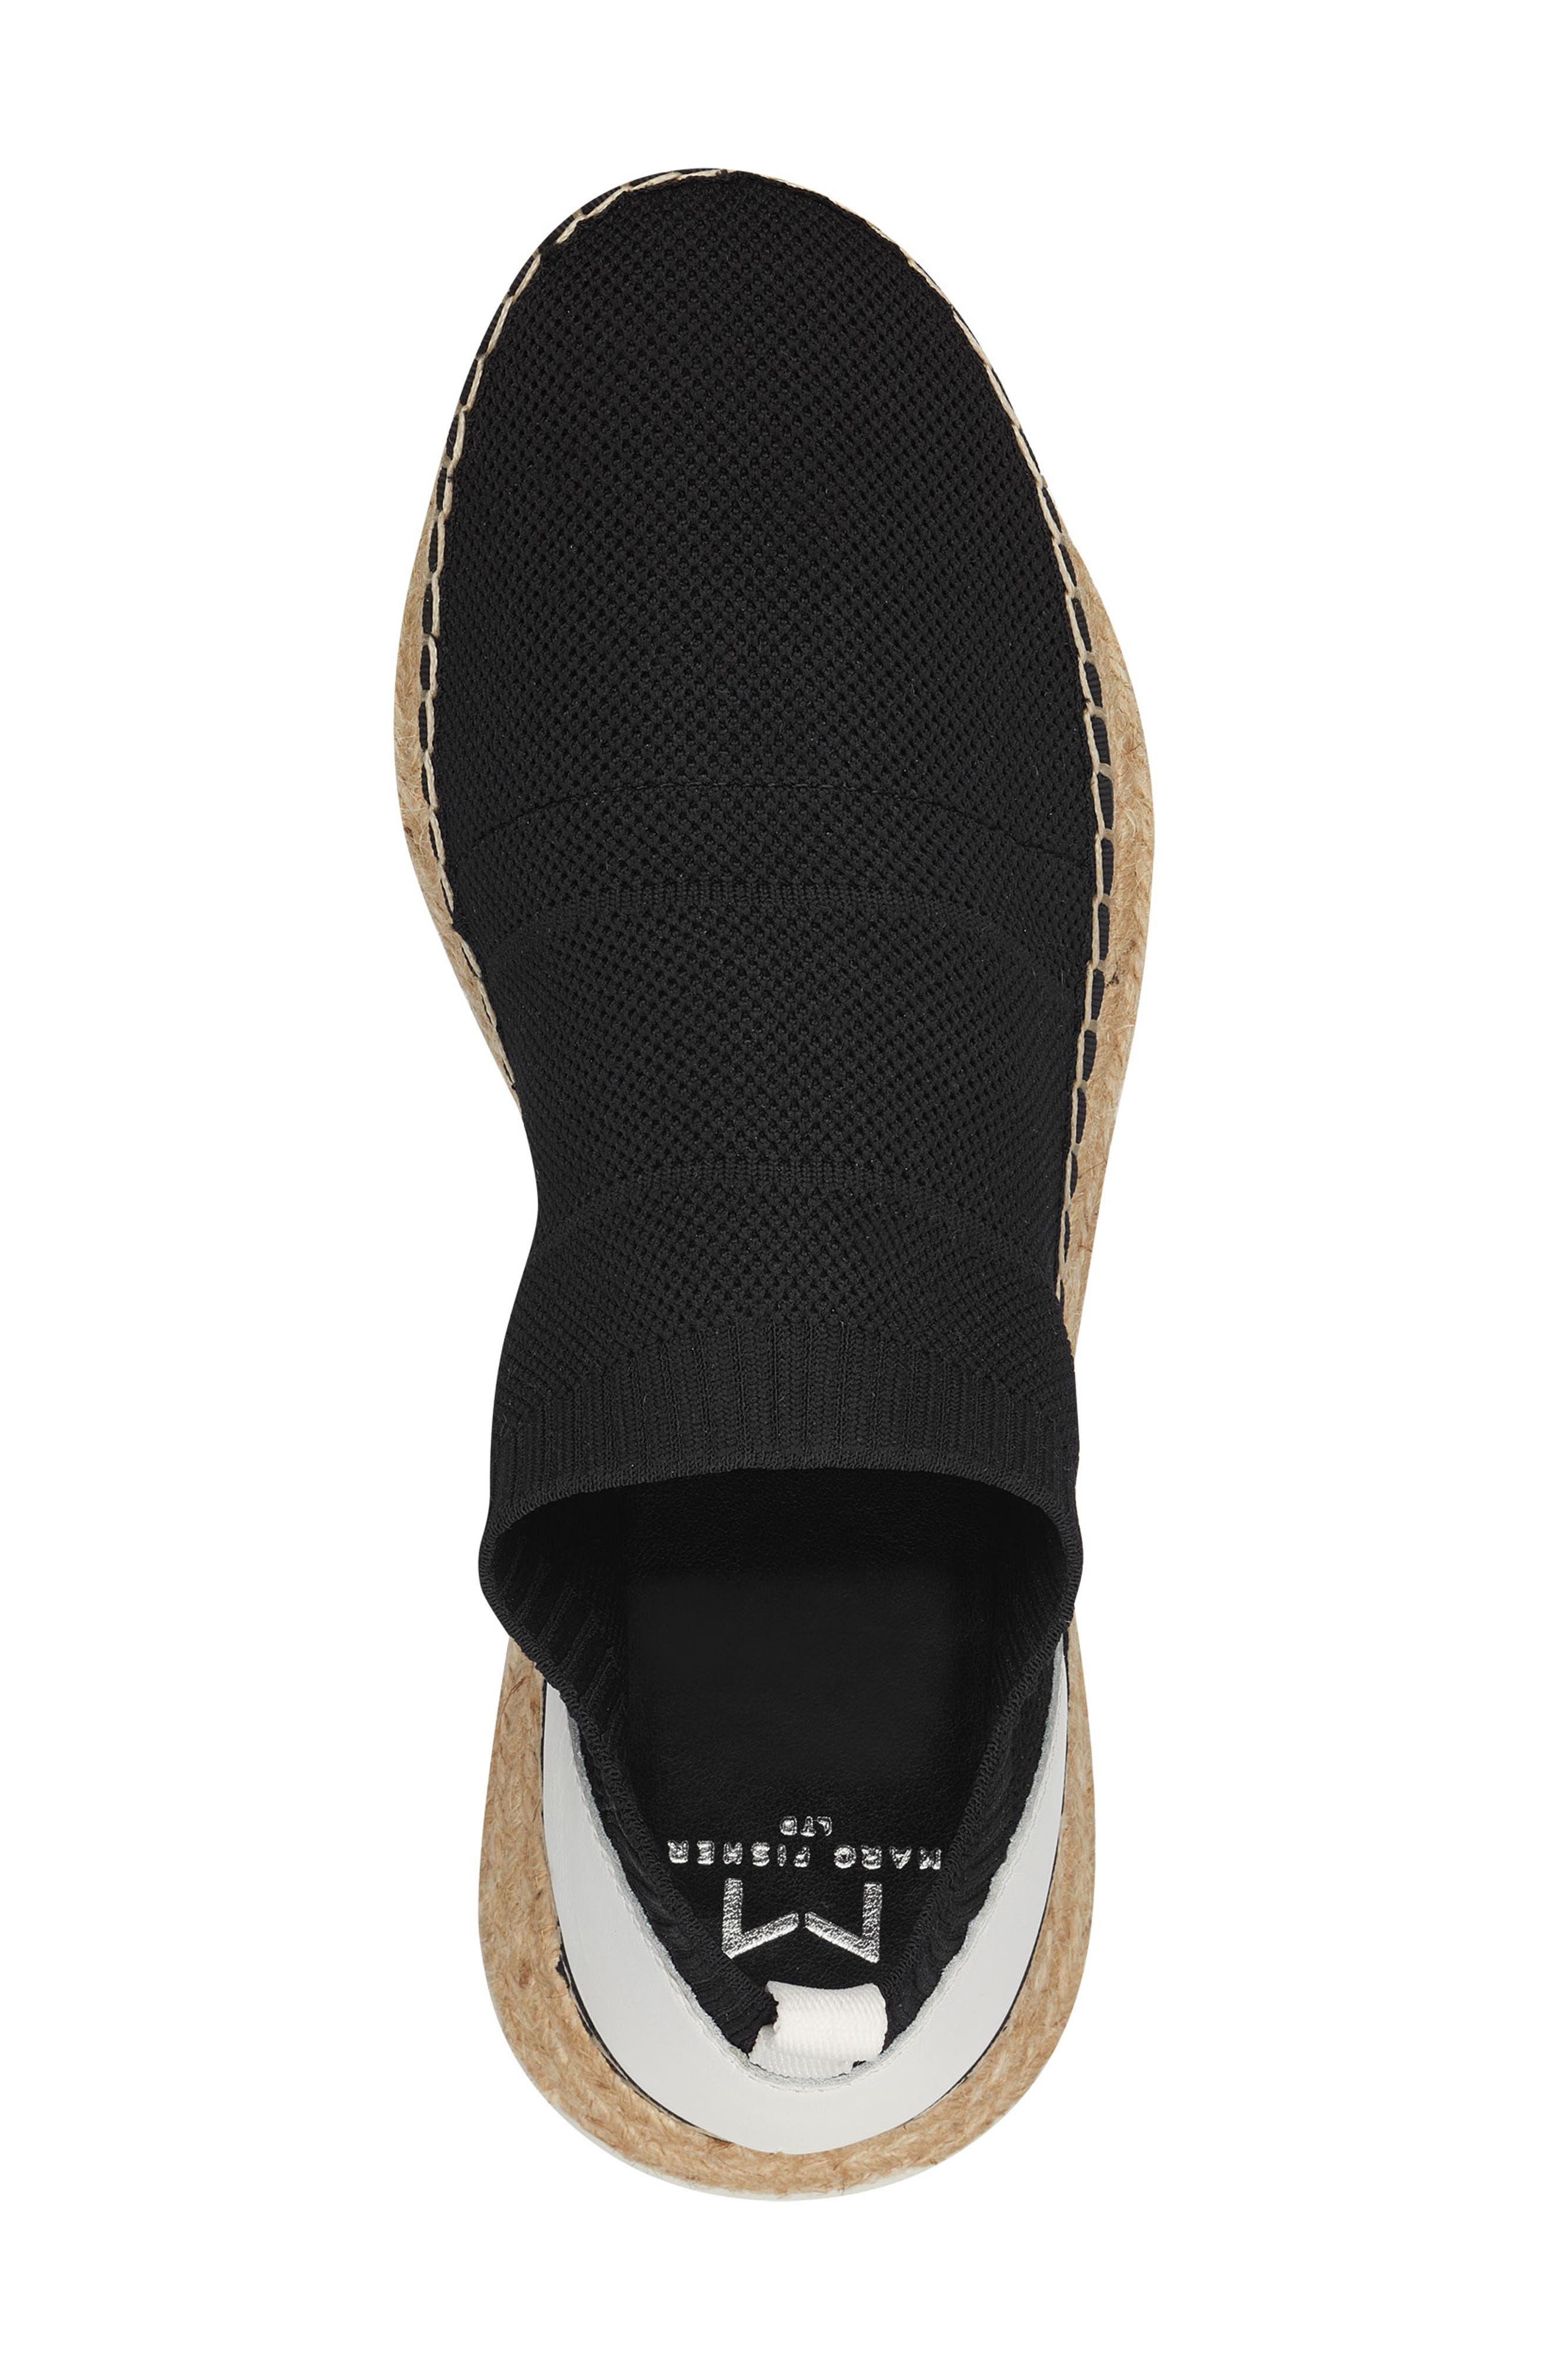 MARC FISHER LTD,                             Jilly Espadrille Sneaker,                             Alternate thumbnail 5, color,                             BLACK FABRIC